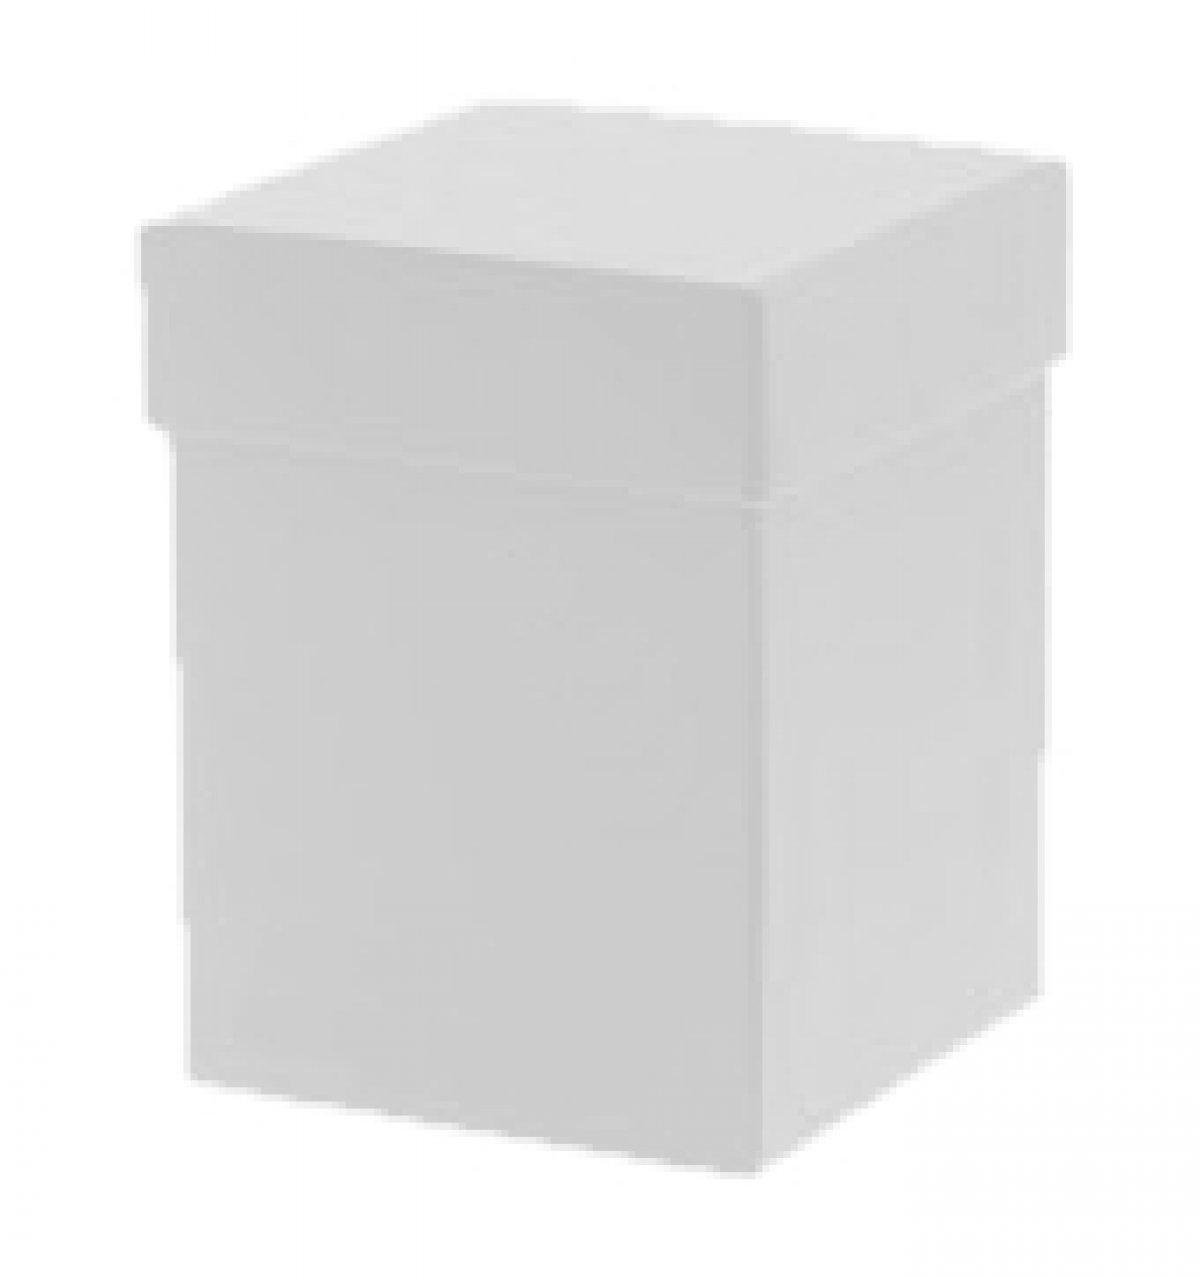 boite cloche blanche pour bougies 180g. Black Bedroom Furniture Sets. Home Design Ideas